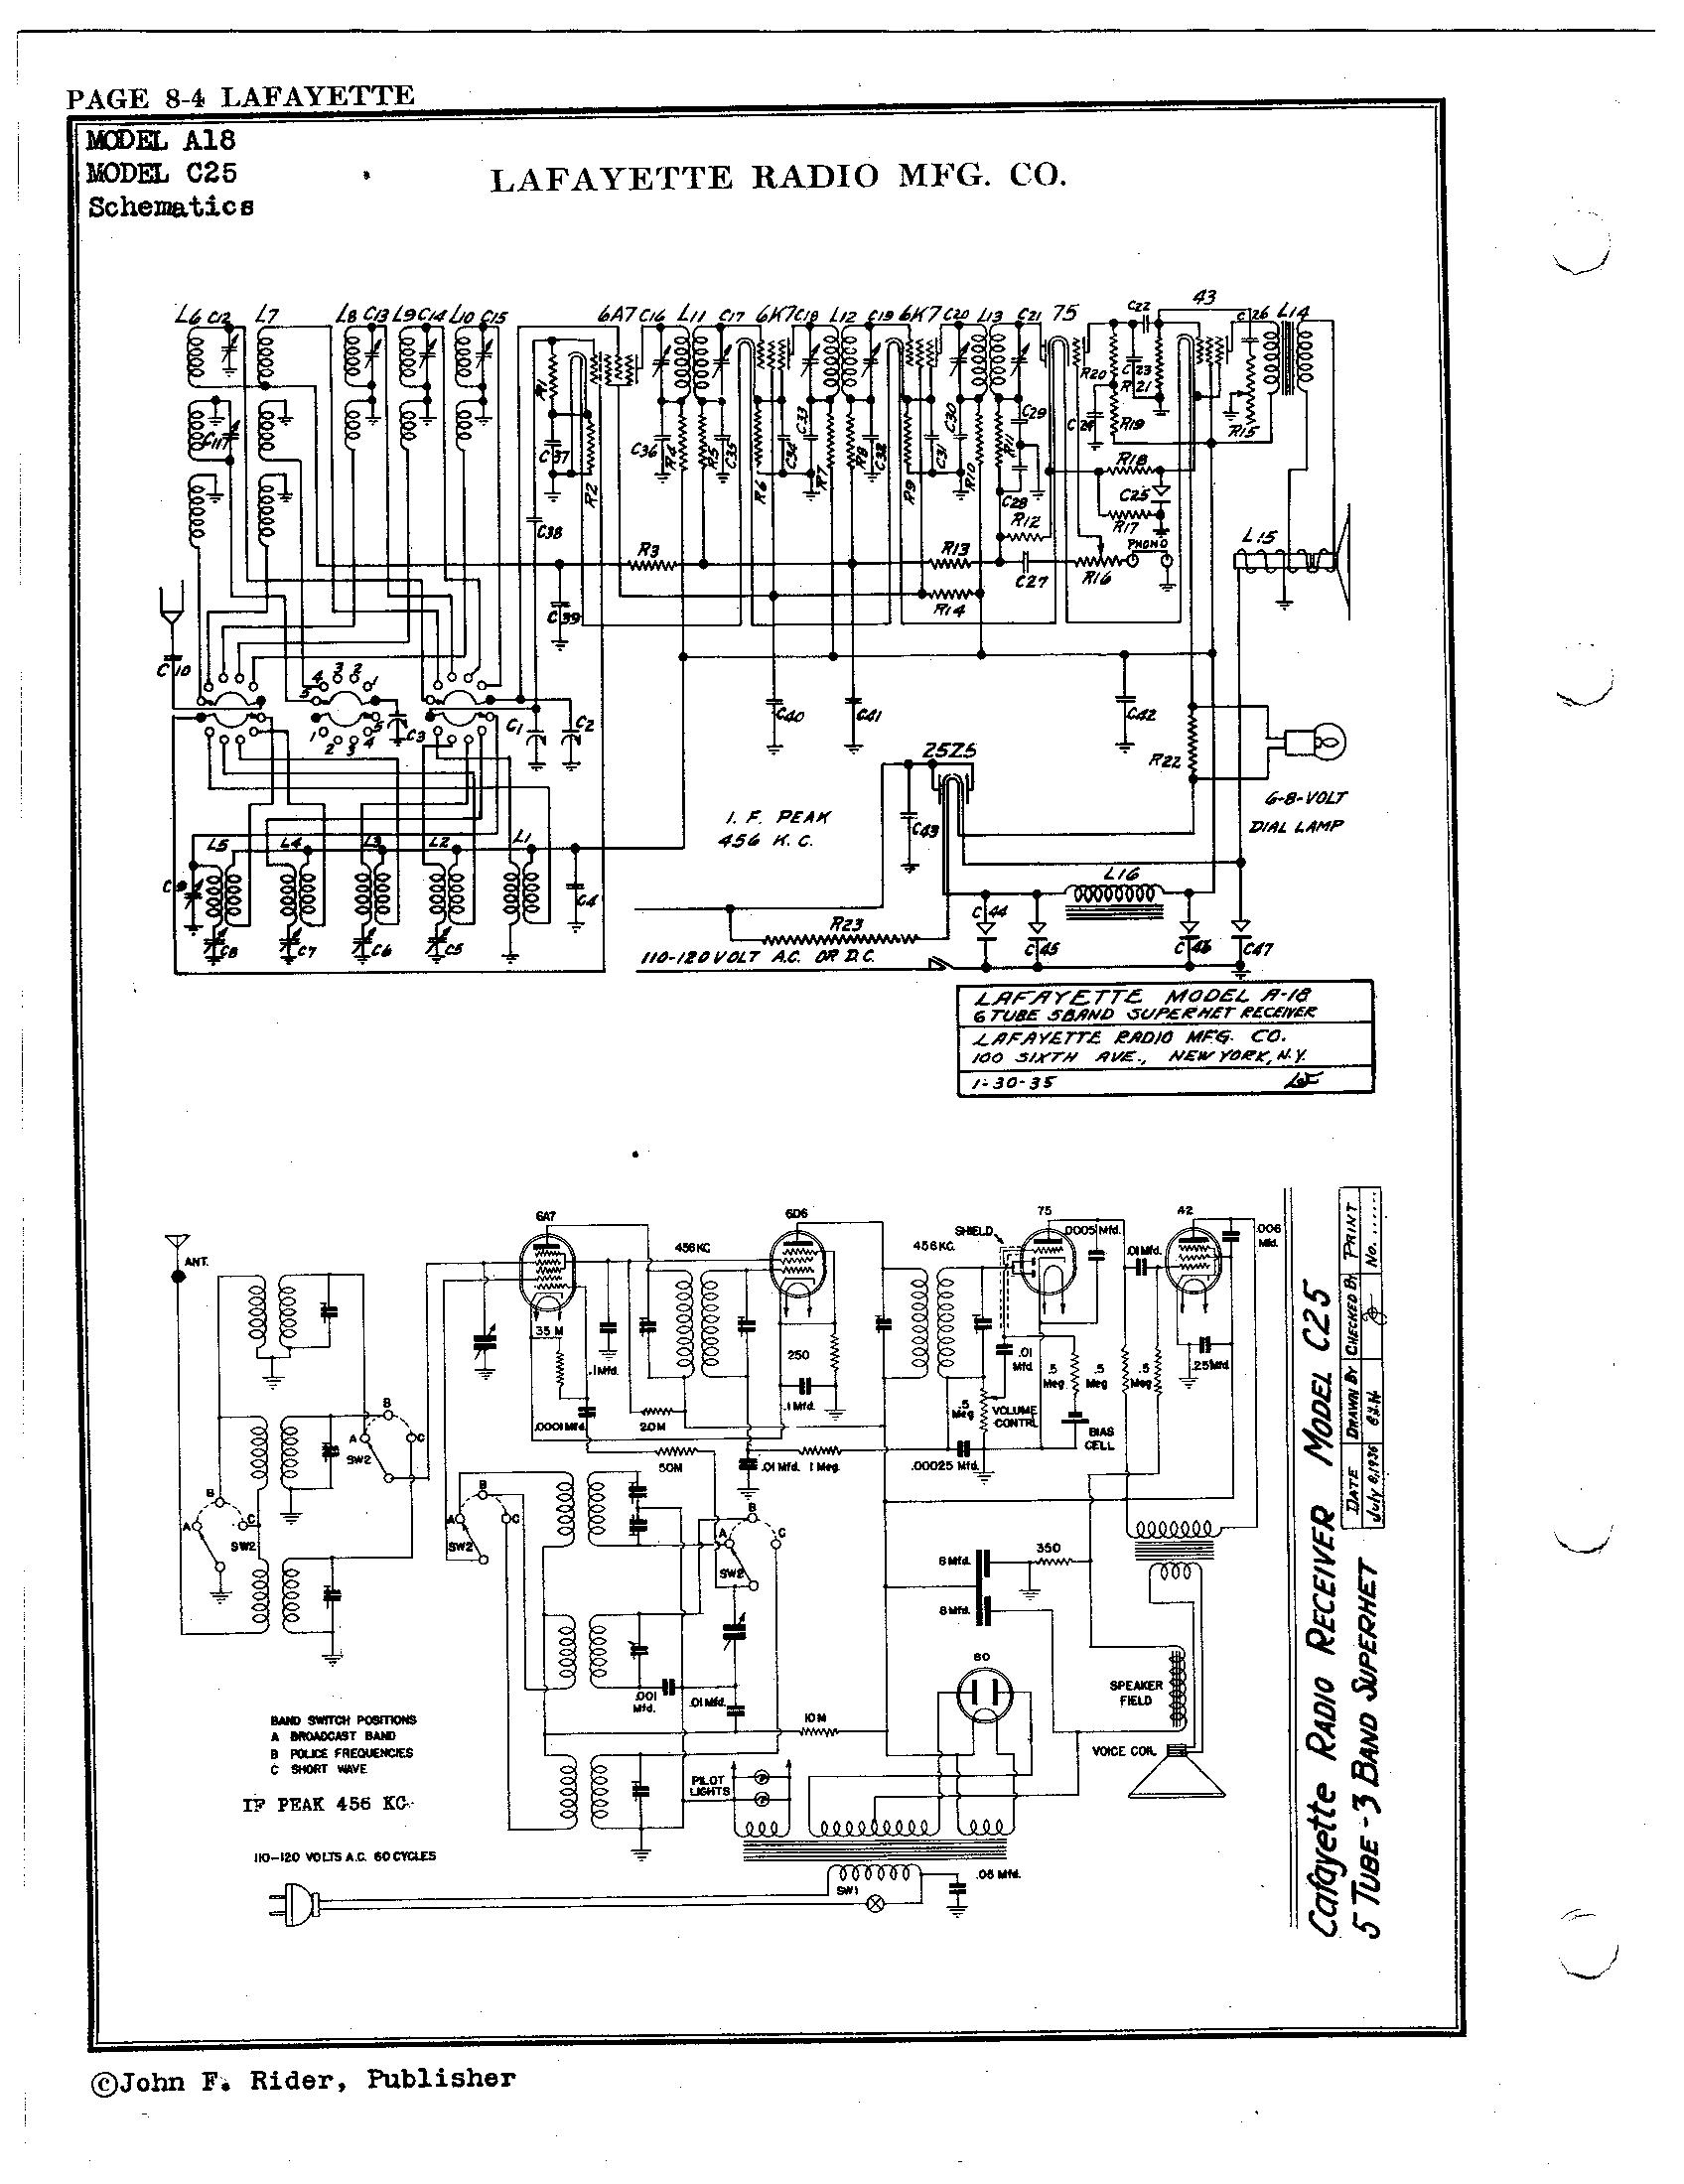 lafayette radio schematics best site wiring diagram rh bruceborowsky com Basic Electrical Schematic Diagrams Light Switch Wiring Diagram